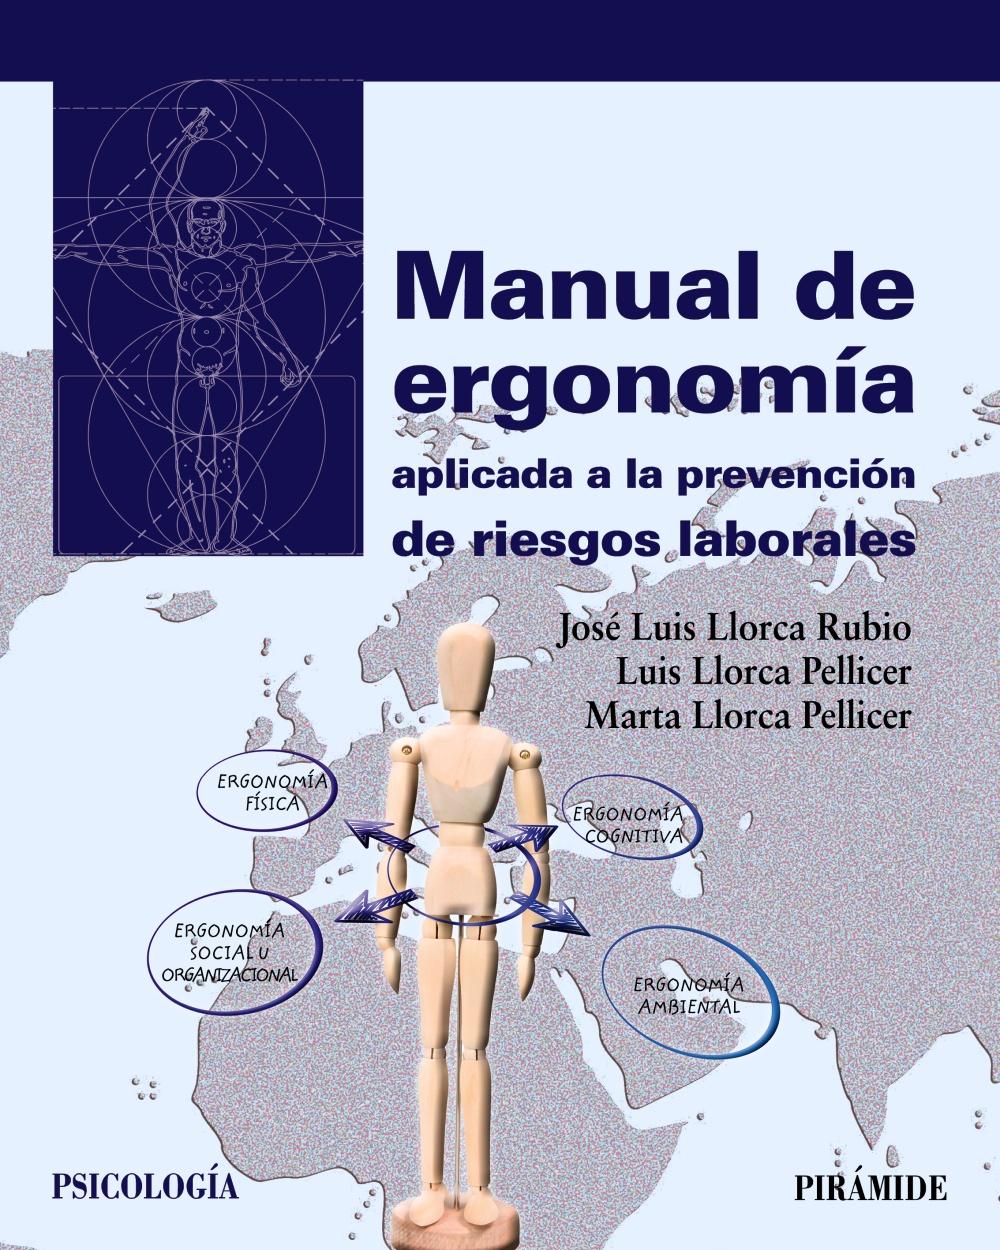 Manual De Ergonomia Aplicada A La Prevencion De Riesgos Laborales - Llorca Rubio Jose Luis